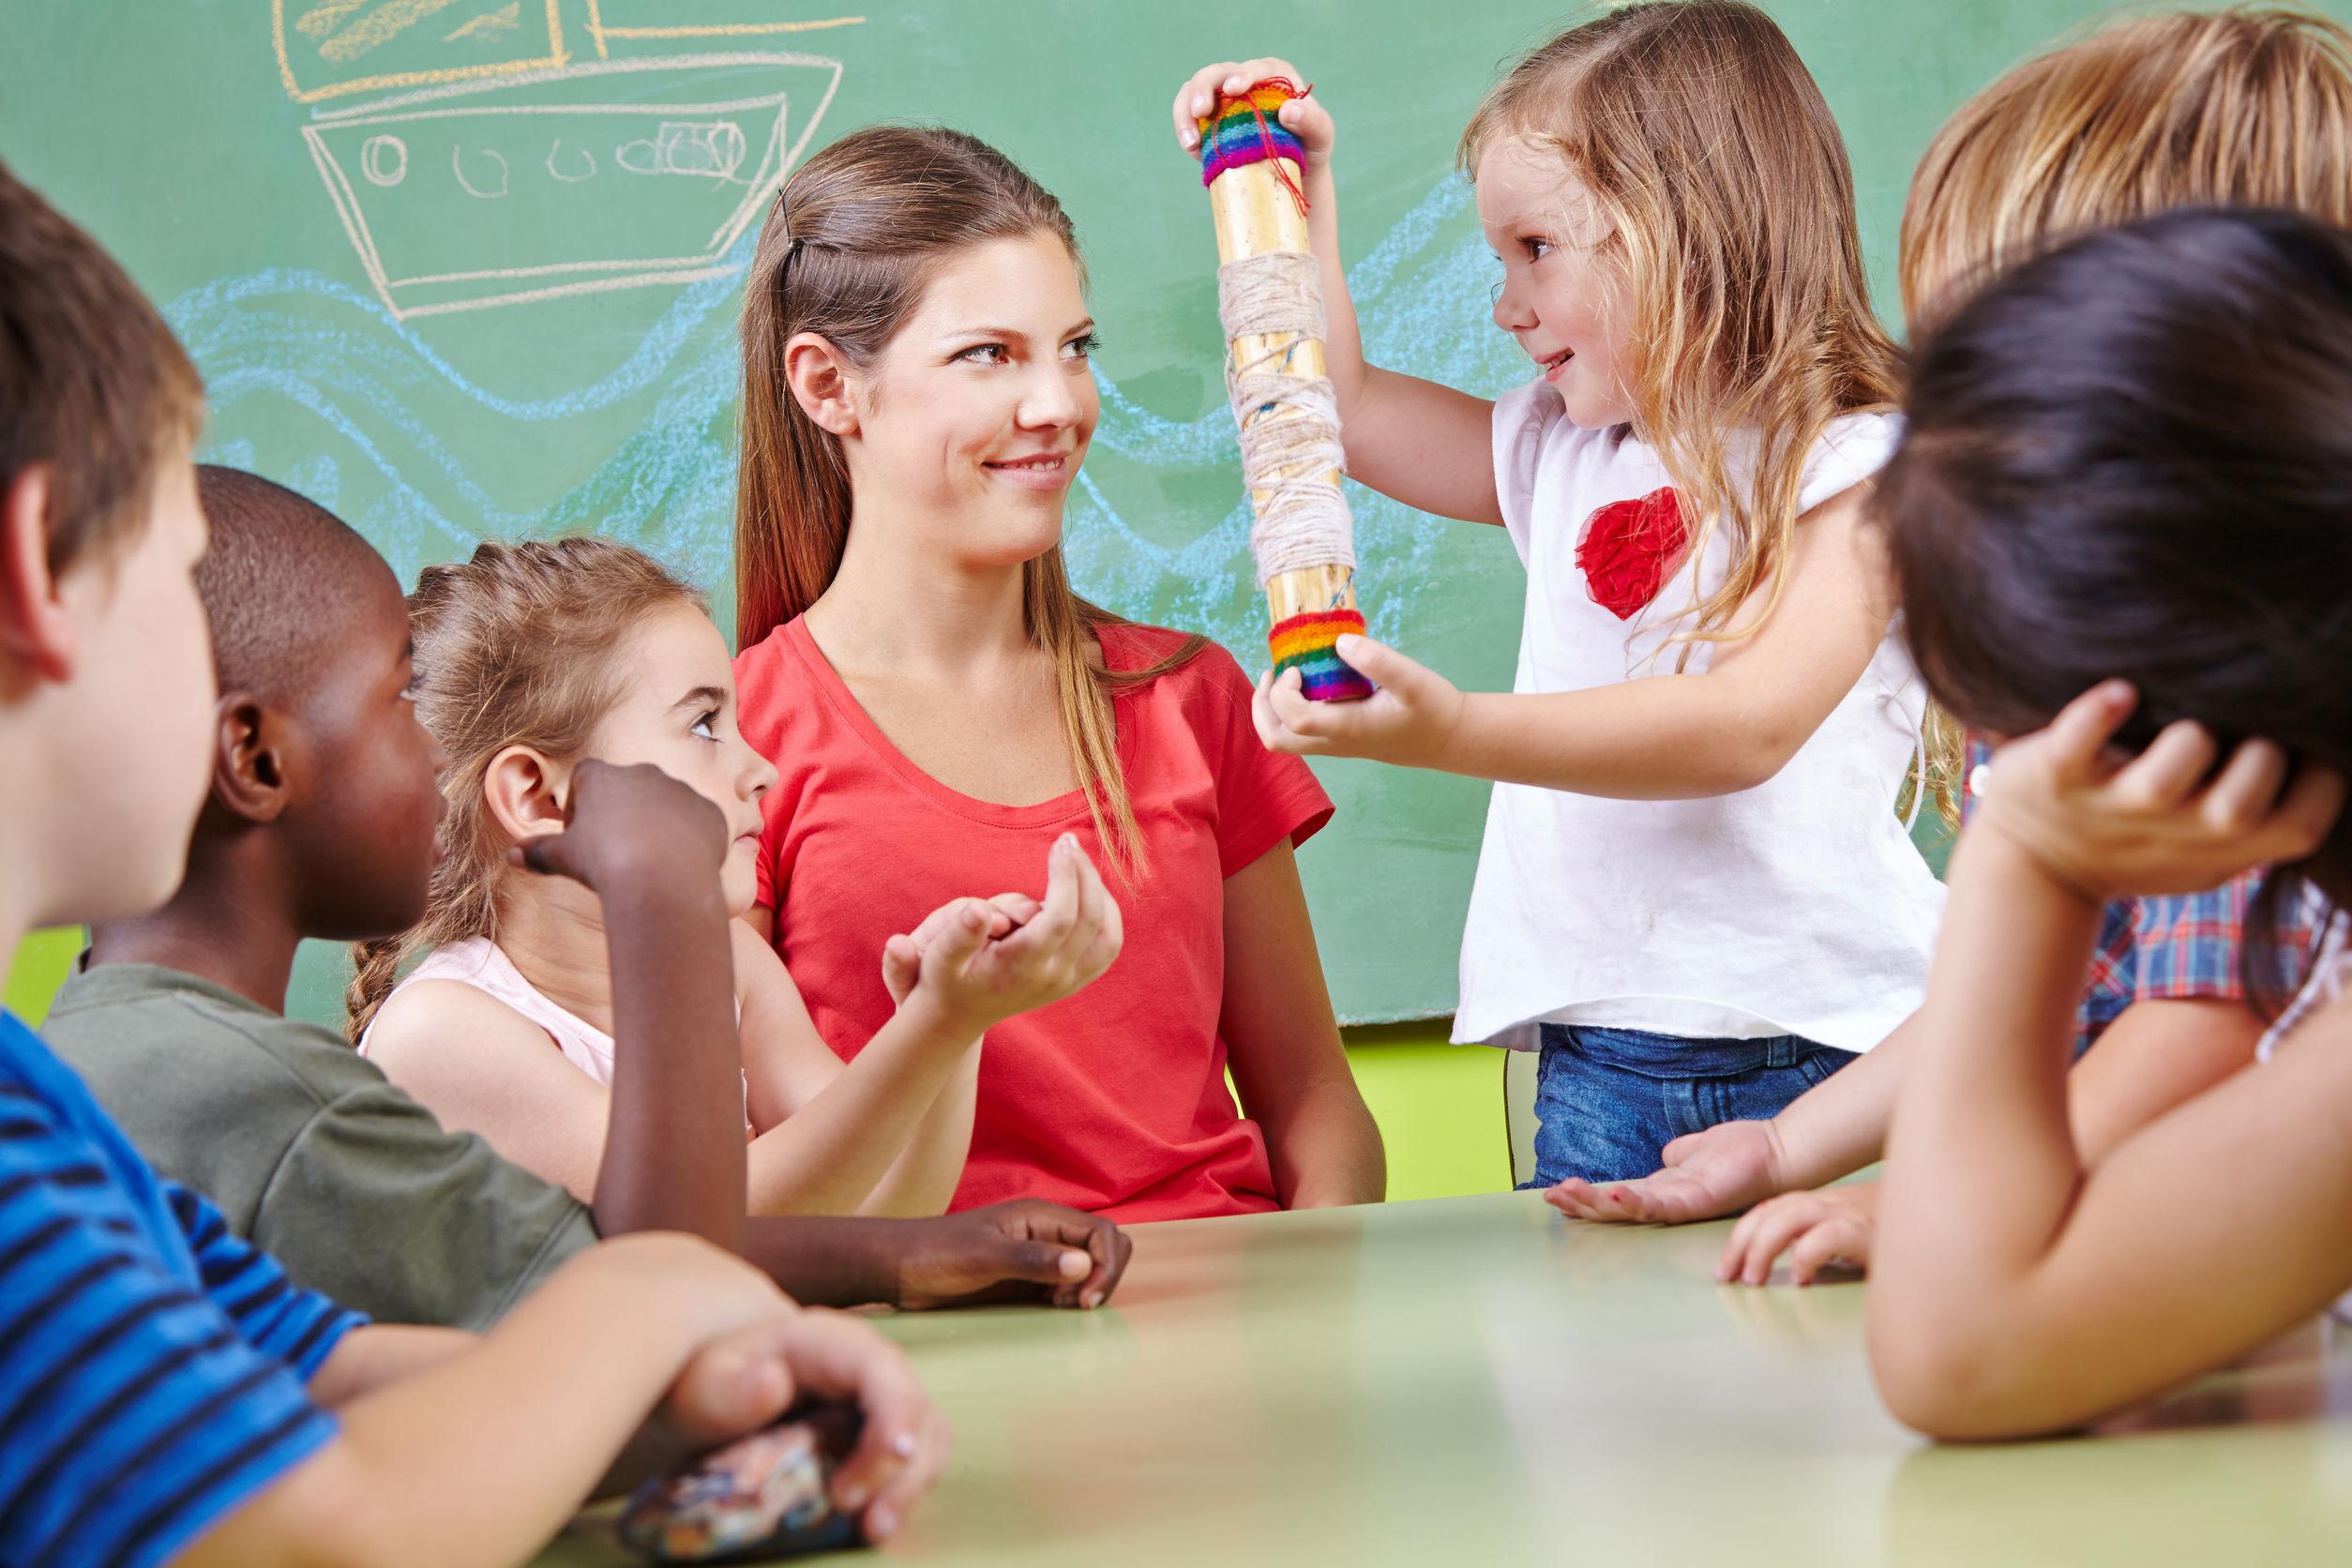 Children_in_musical_education_in_kindergarten.jpg